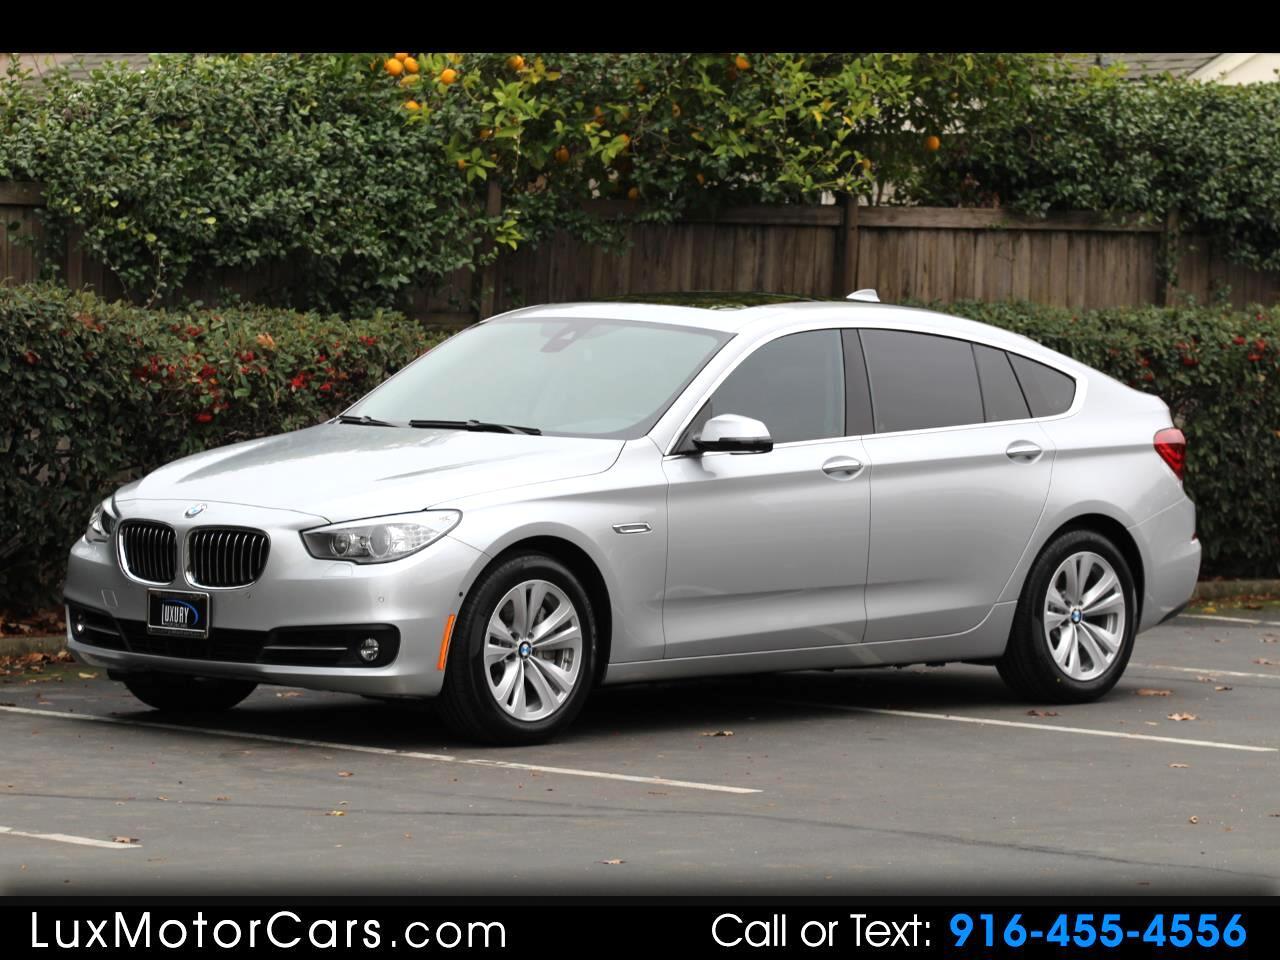 2015 BMW 5-Series Gran Turismo 535i